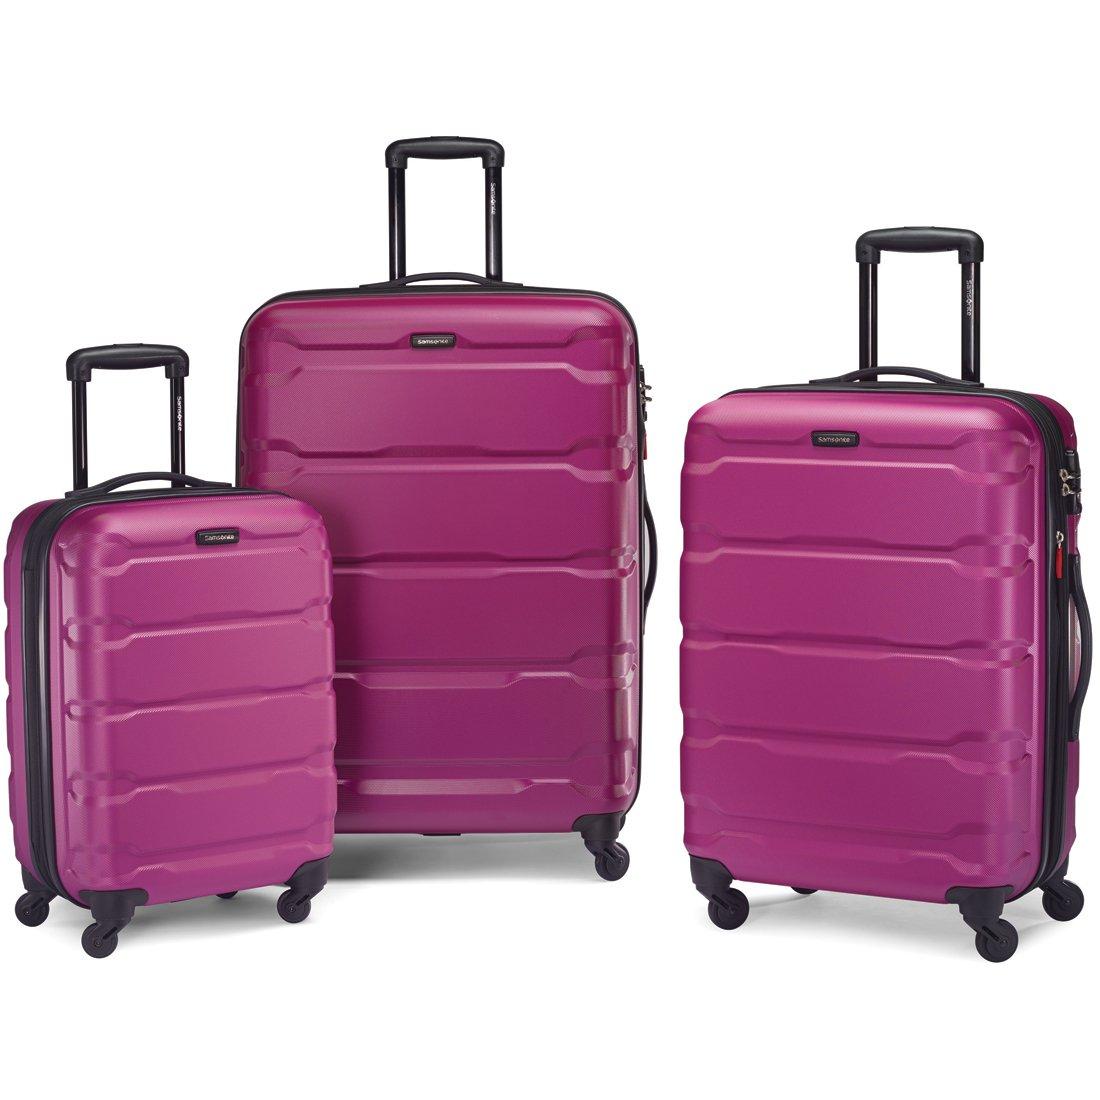 7beac54bebf8 Samsonite Omni Hardside Luggage Nested Spinner Set (20